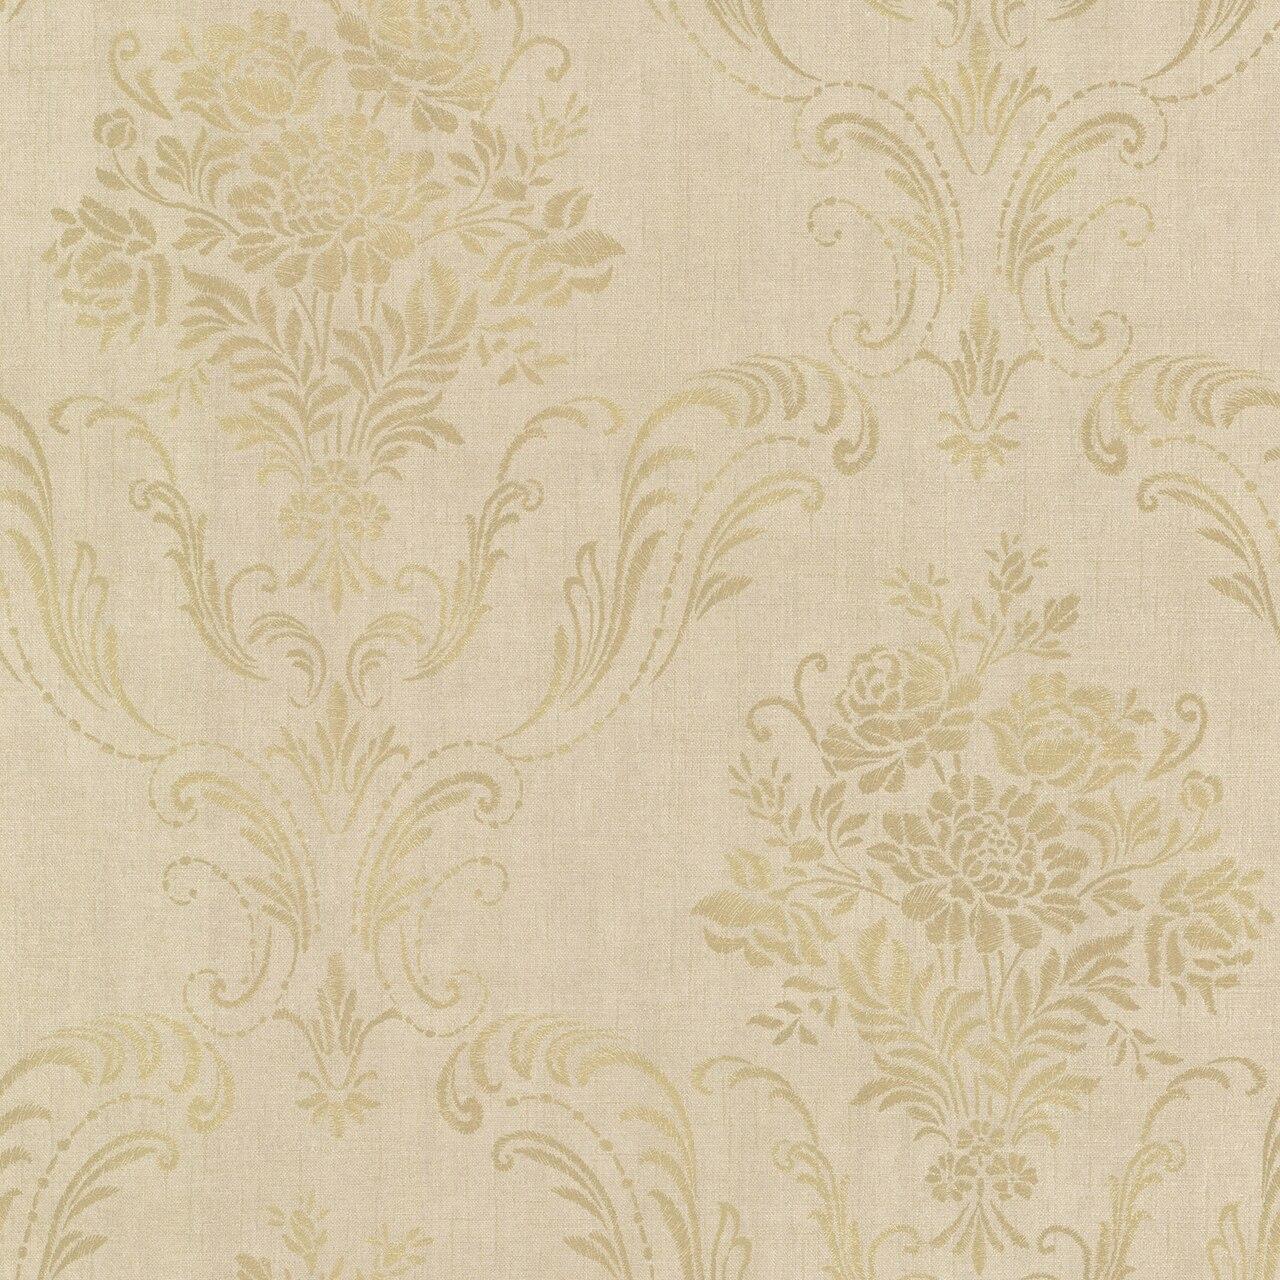 Brewster 2665 21446 Avalon Manor Gold Floral Damask Wallpaper 1280x1280